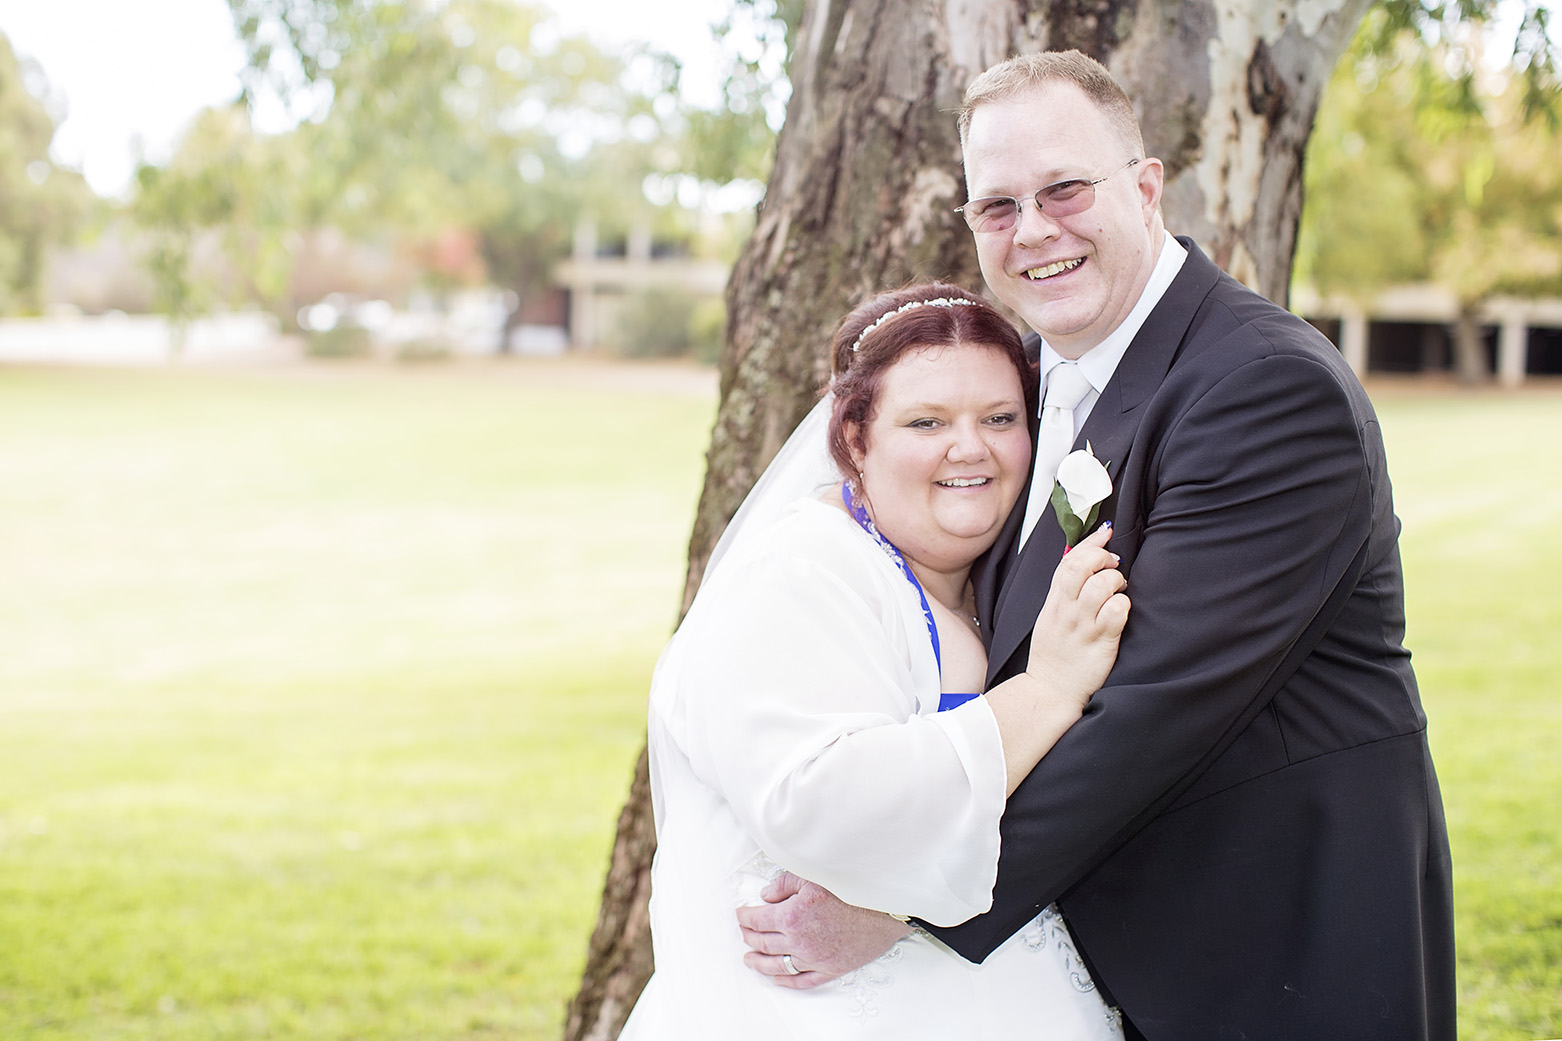 Sferas Modbury wedding 26.jpg